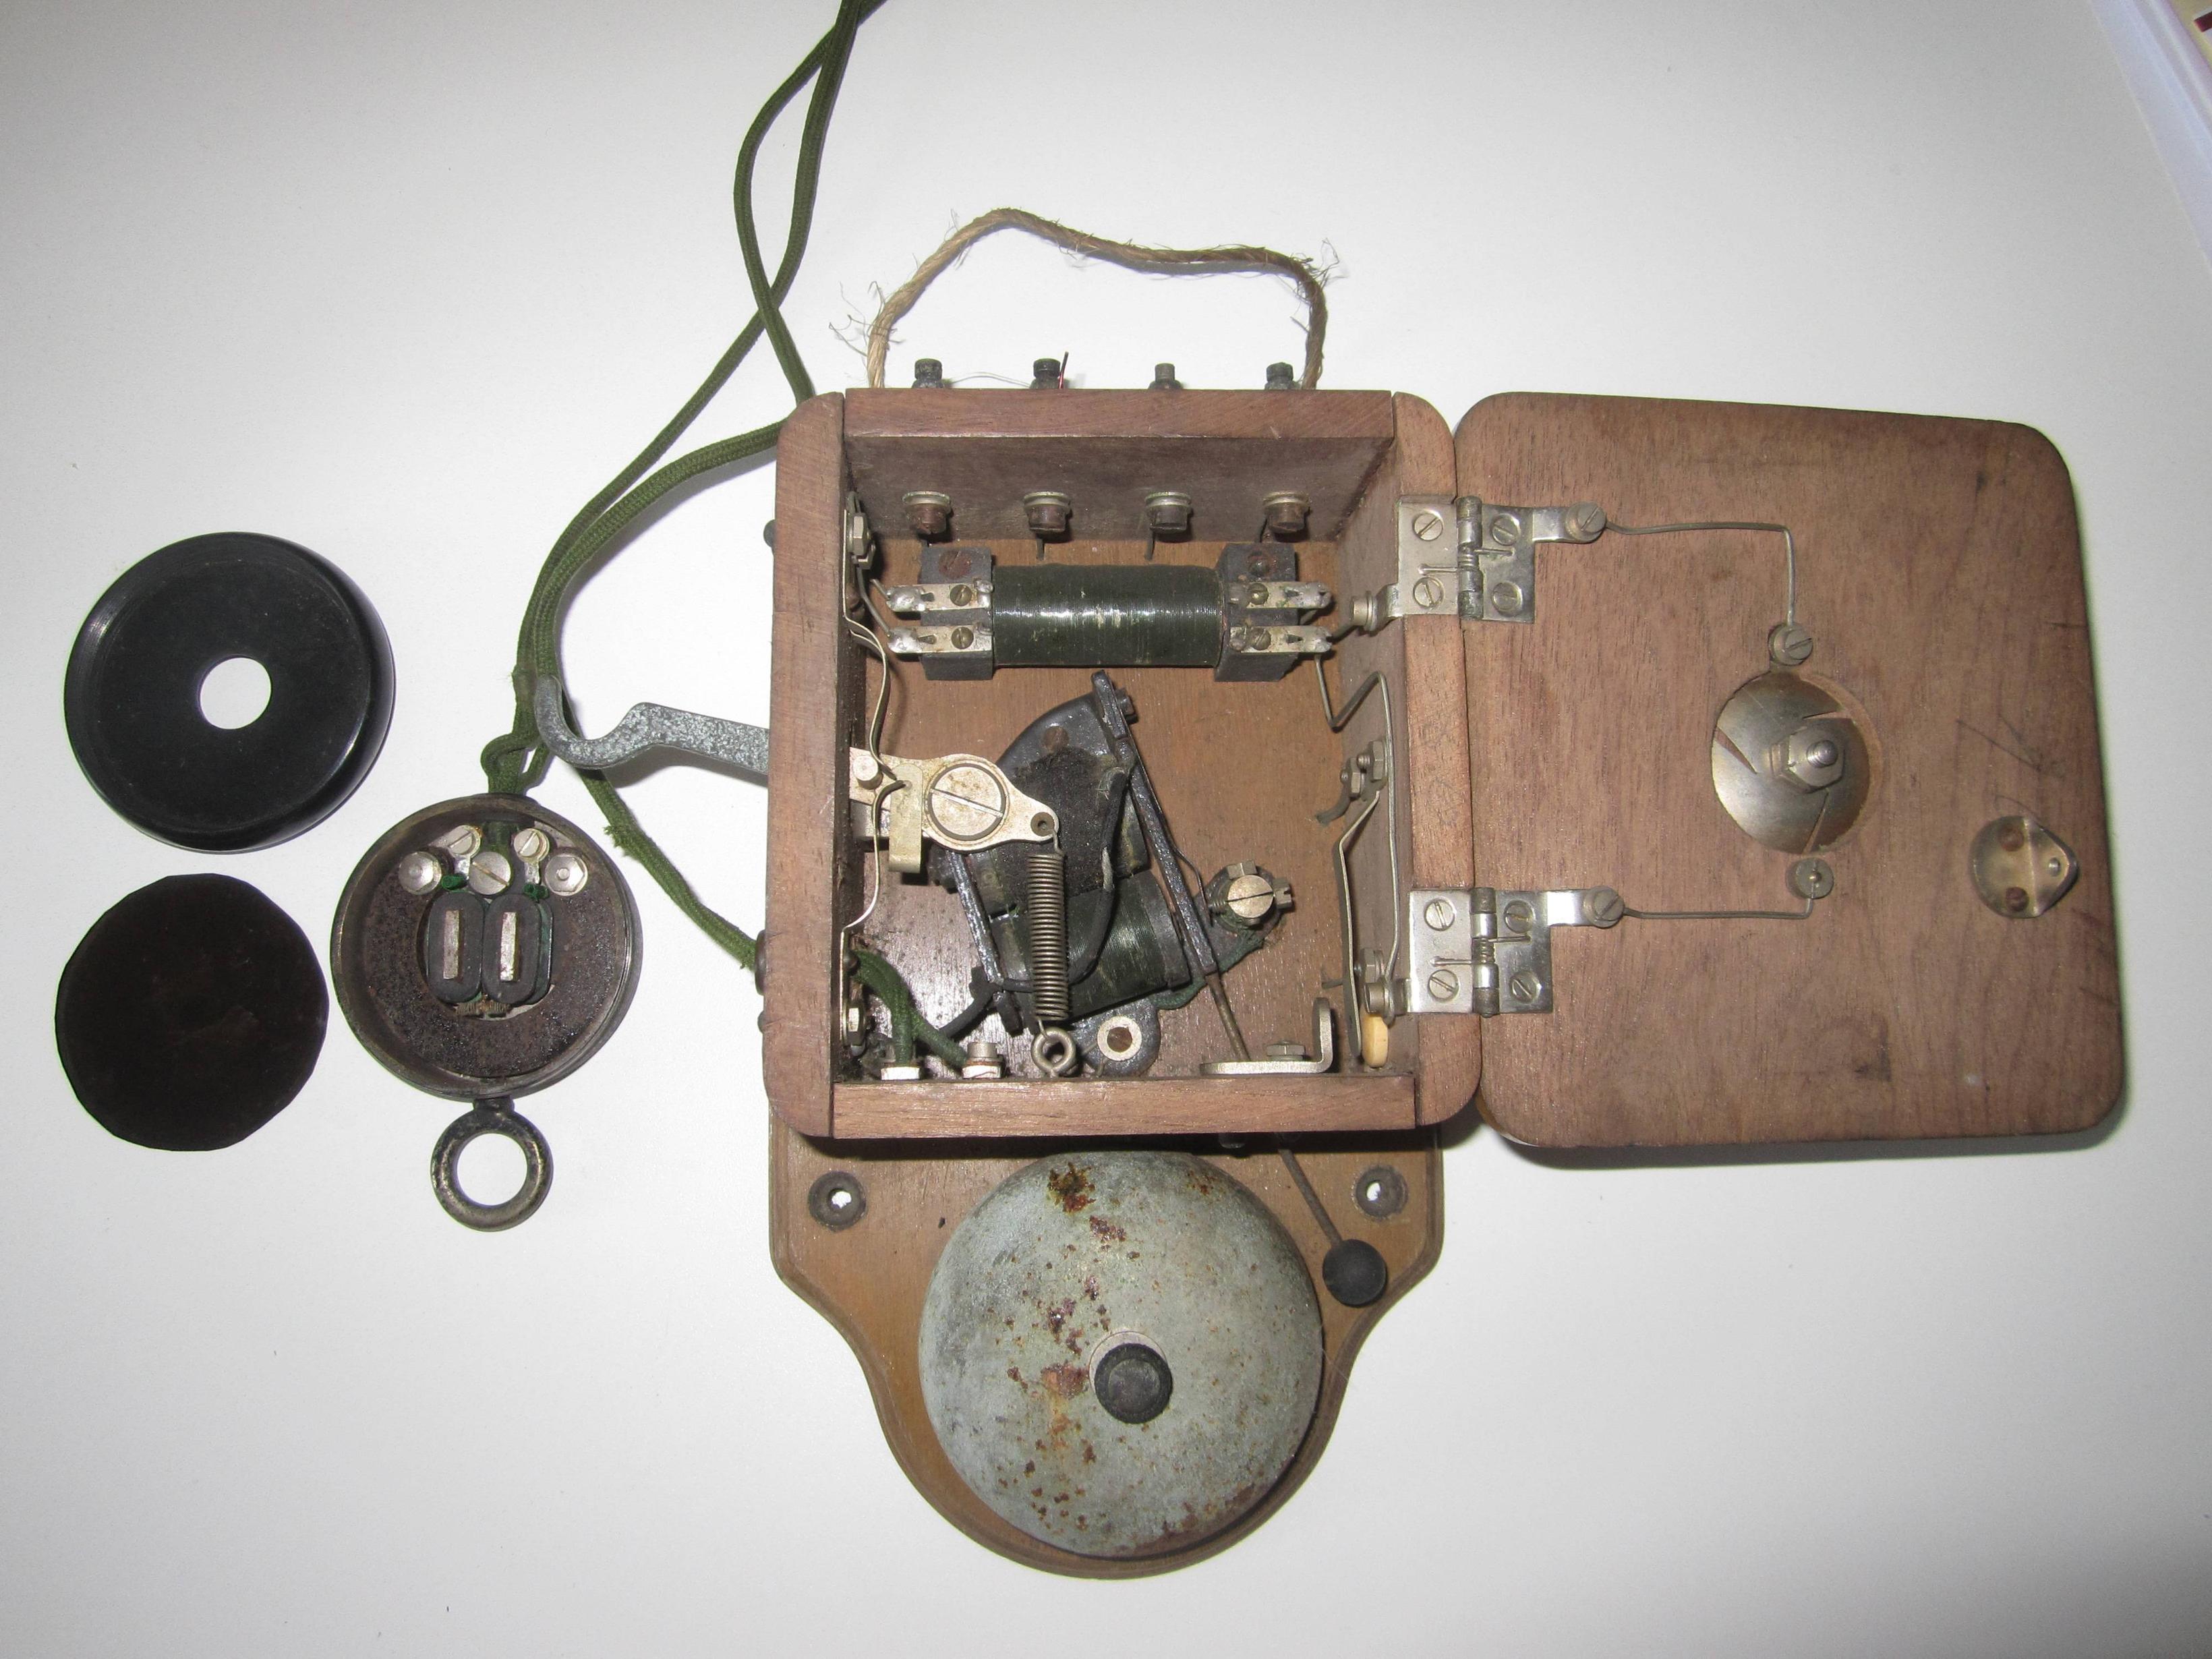 Vintage Telephone Wiring Diagram   Manual E-Books - Old Telephone Wiring Diagram